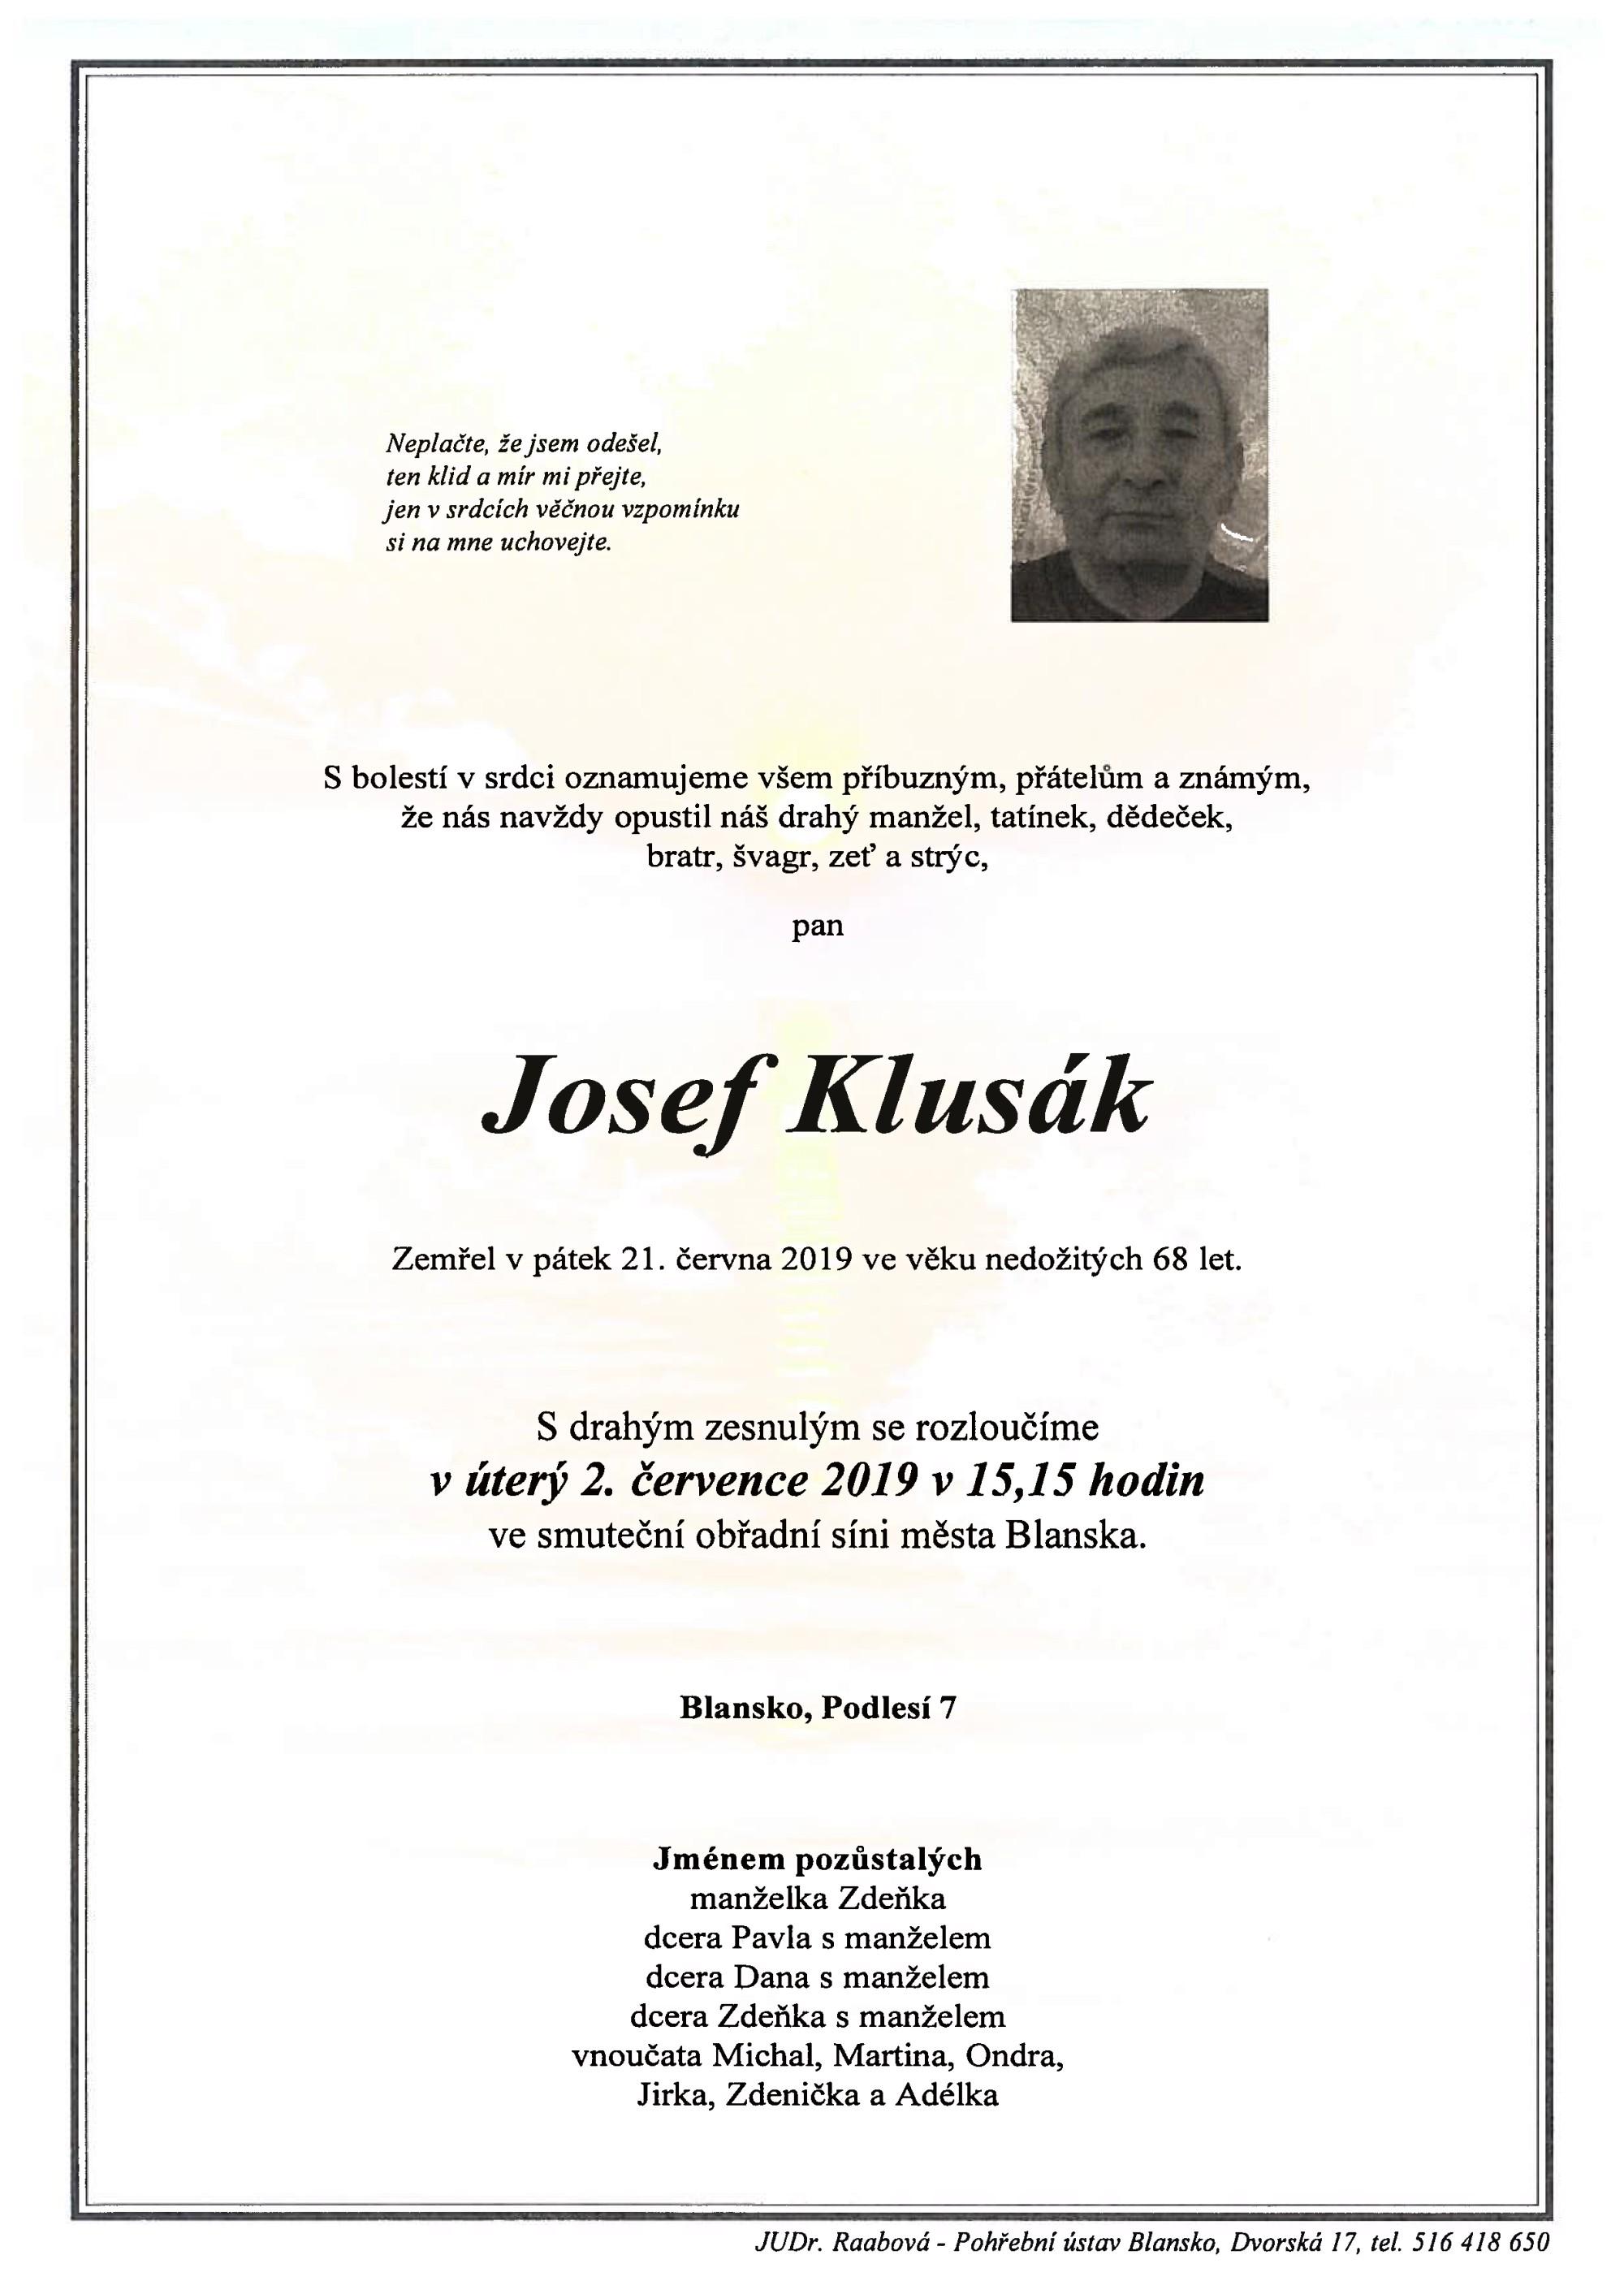 Josef Klusák